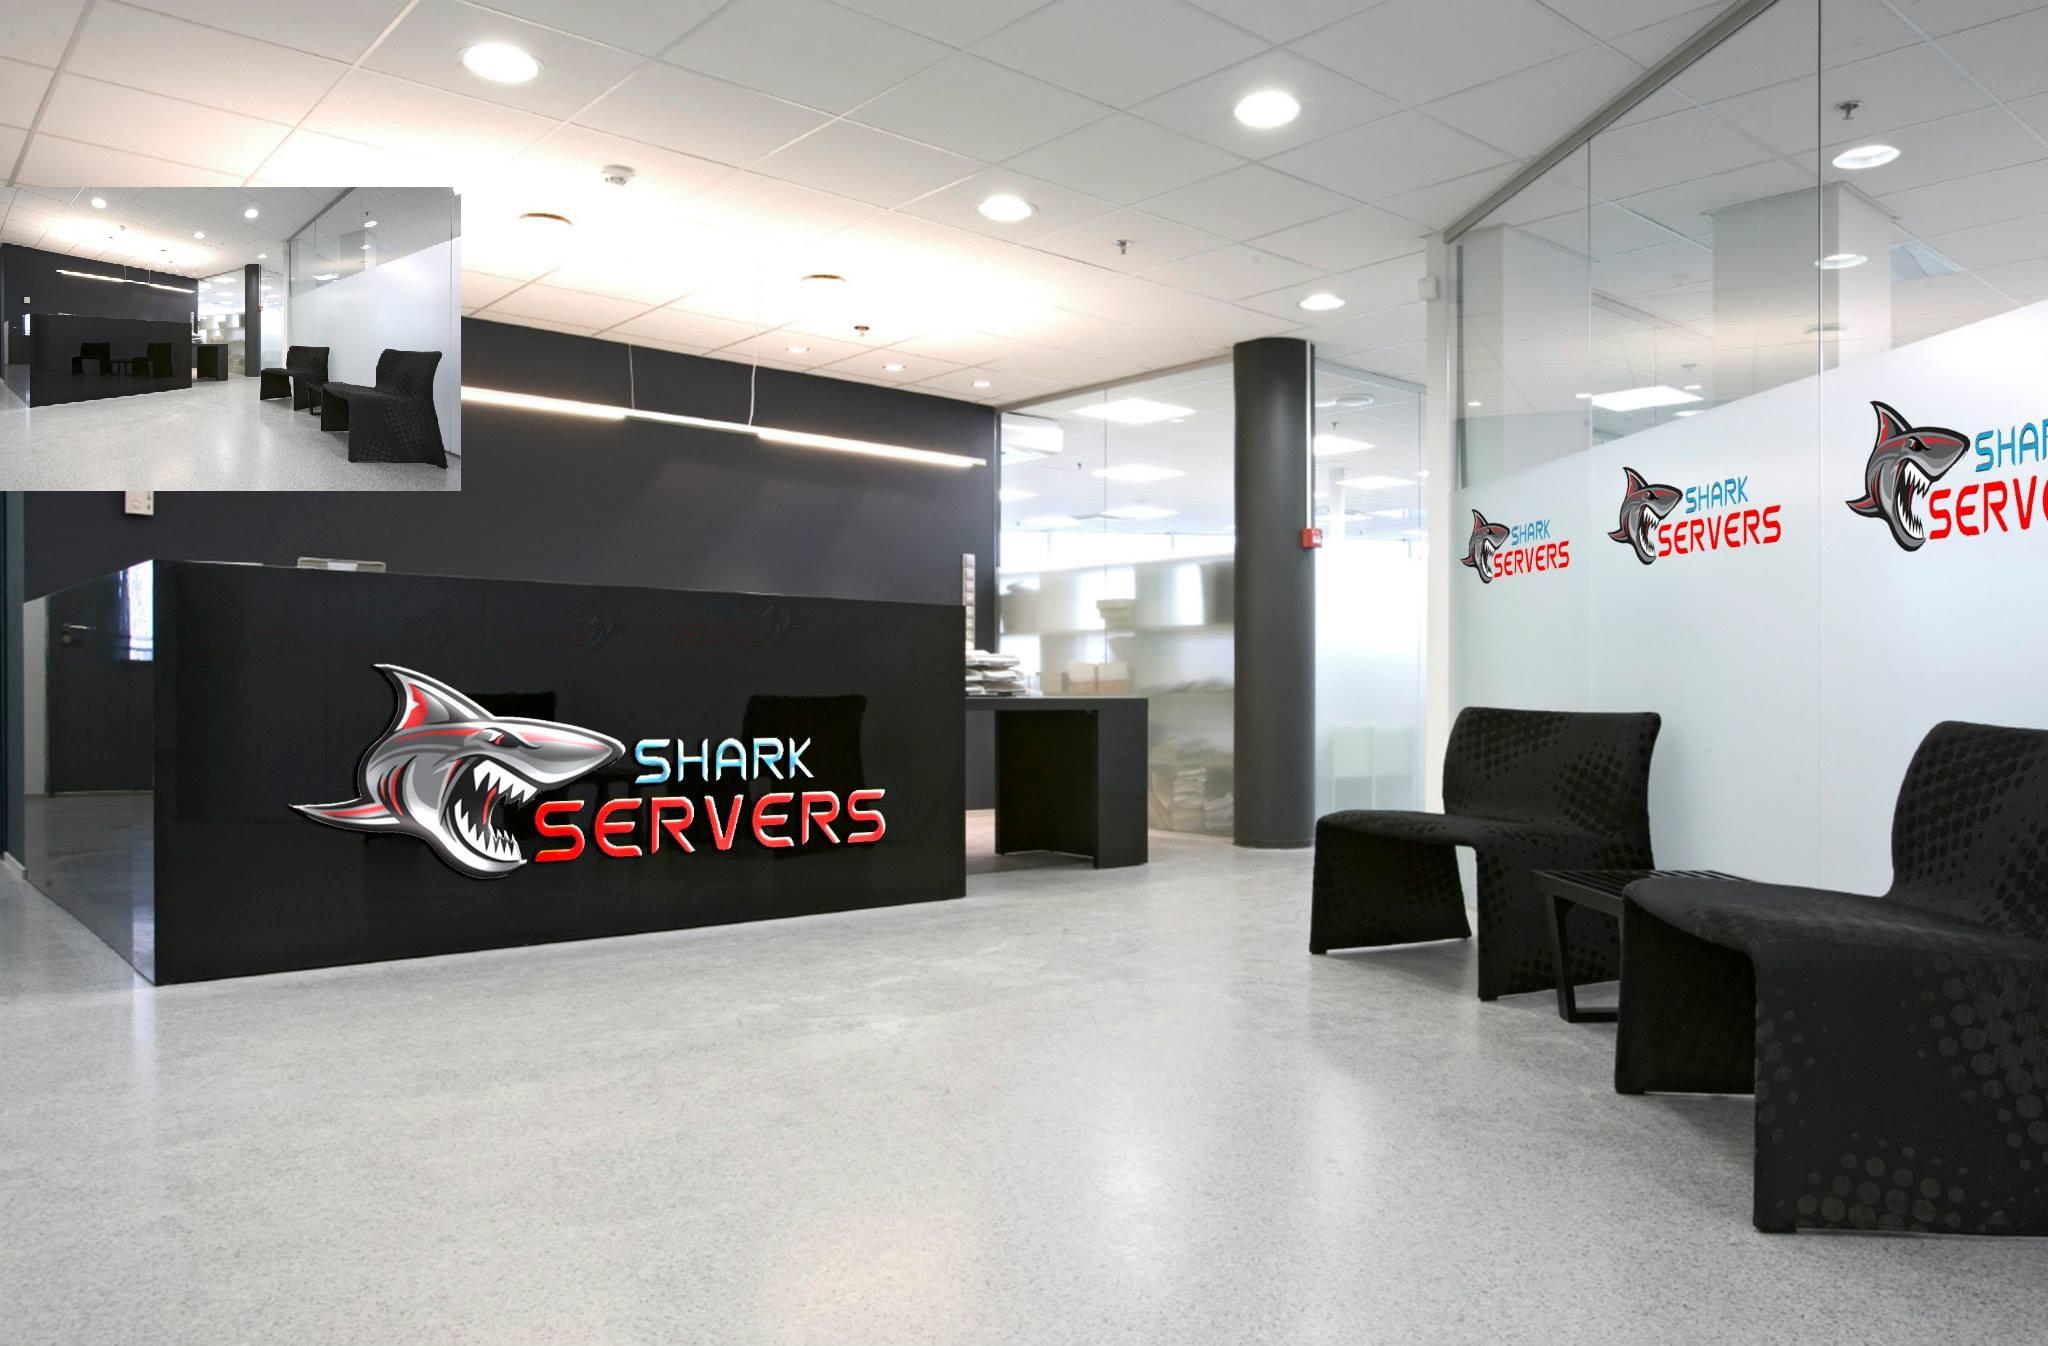 Sharkserve 德国、芬兰、英国、荷兰、俄罗斯等15刀年付 2C2G 25GB NVMe-VPS SO